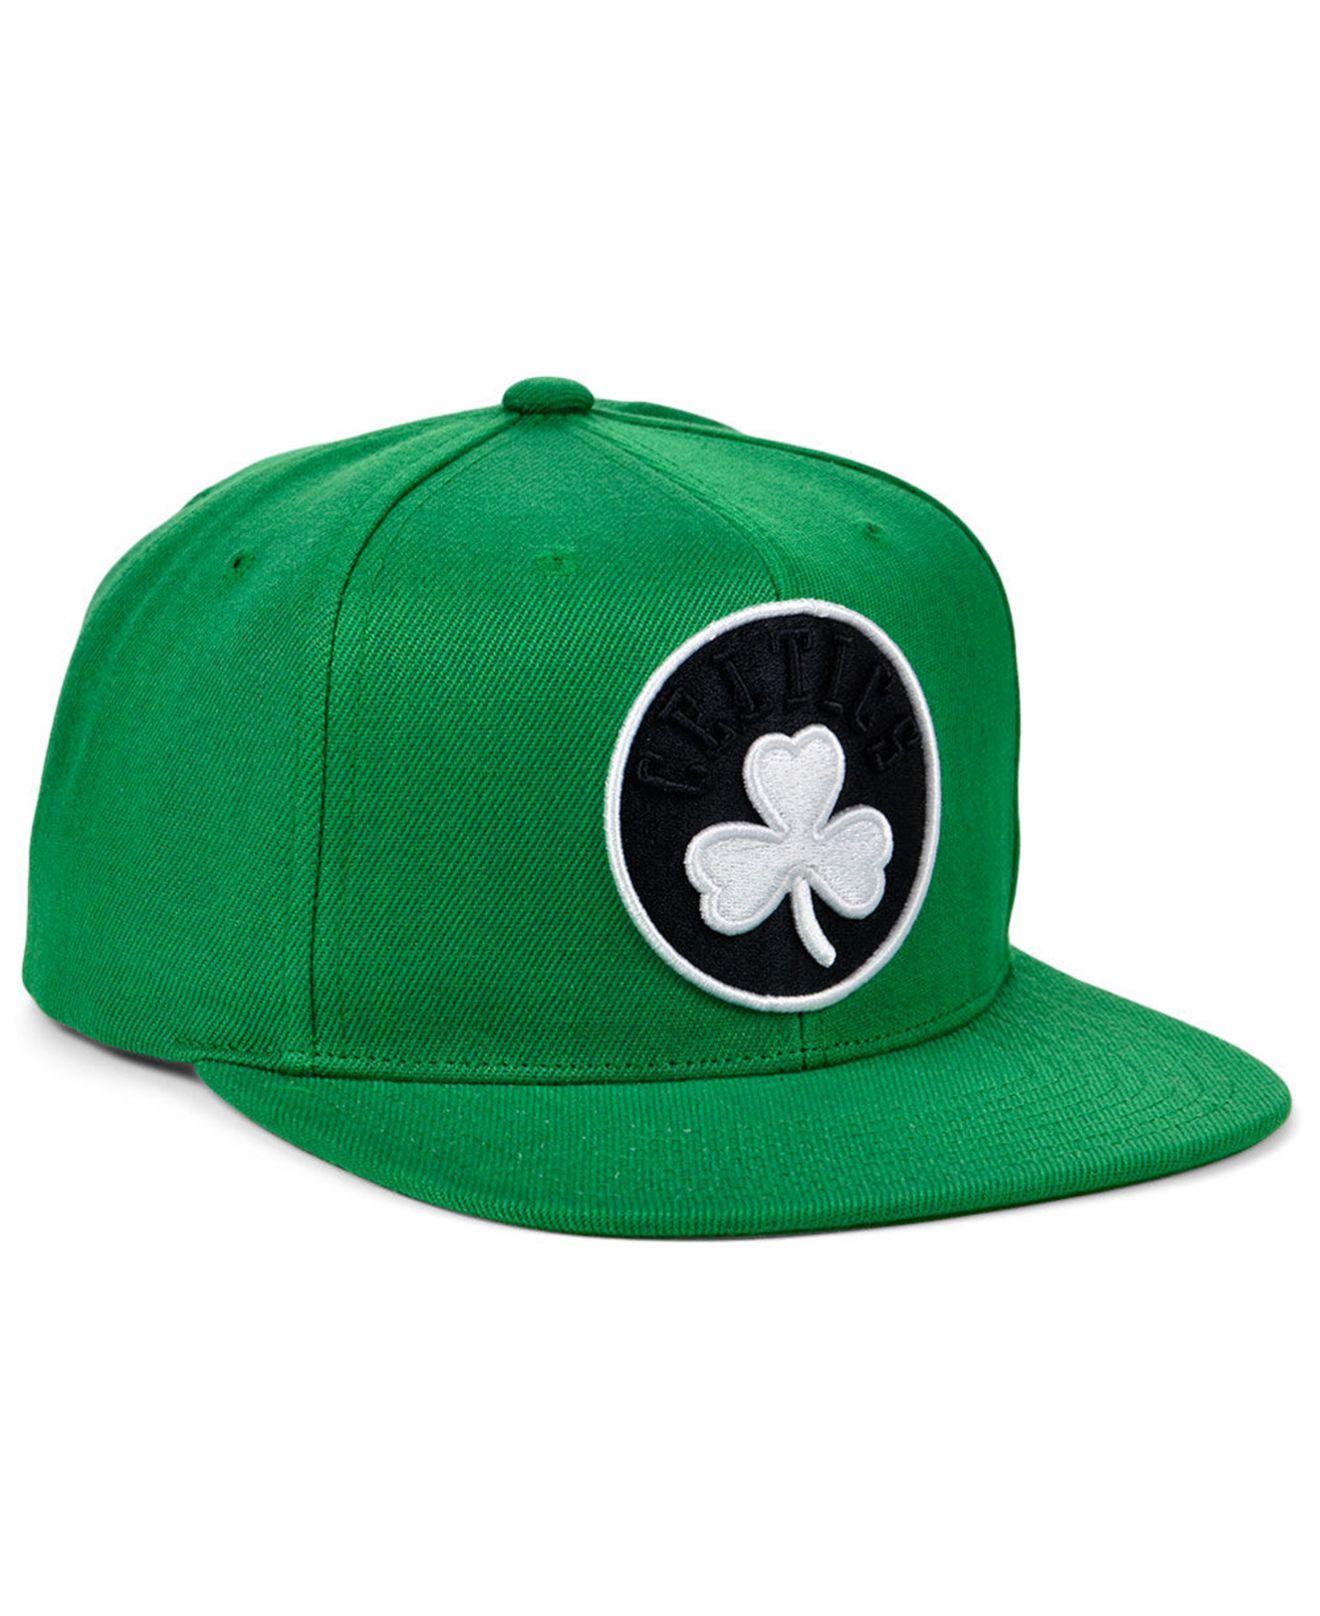 amazing selection to buy most popular Mitchell & Ness Synthetic Boston Celtics Full Court Pop Snapback ...